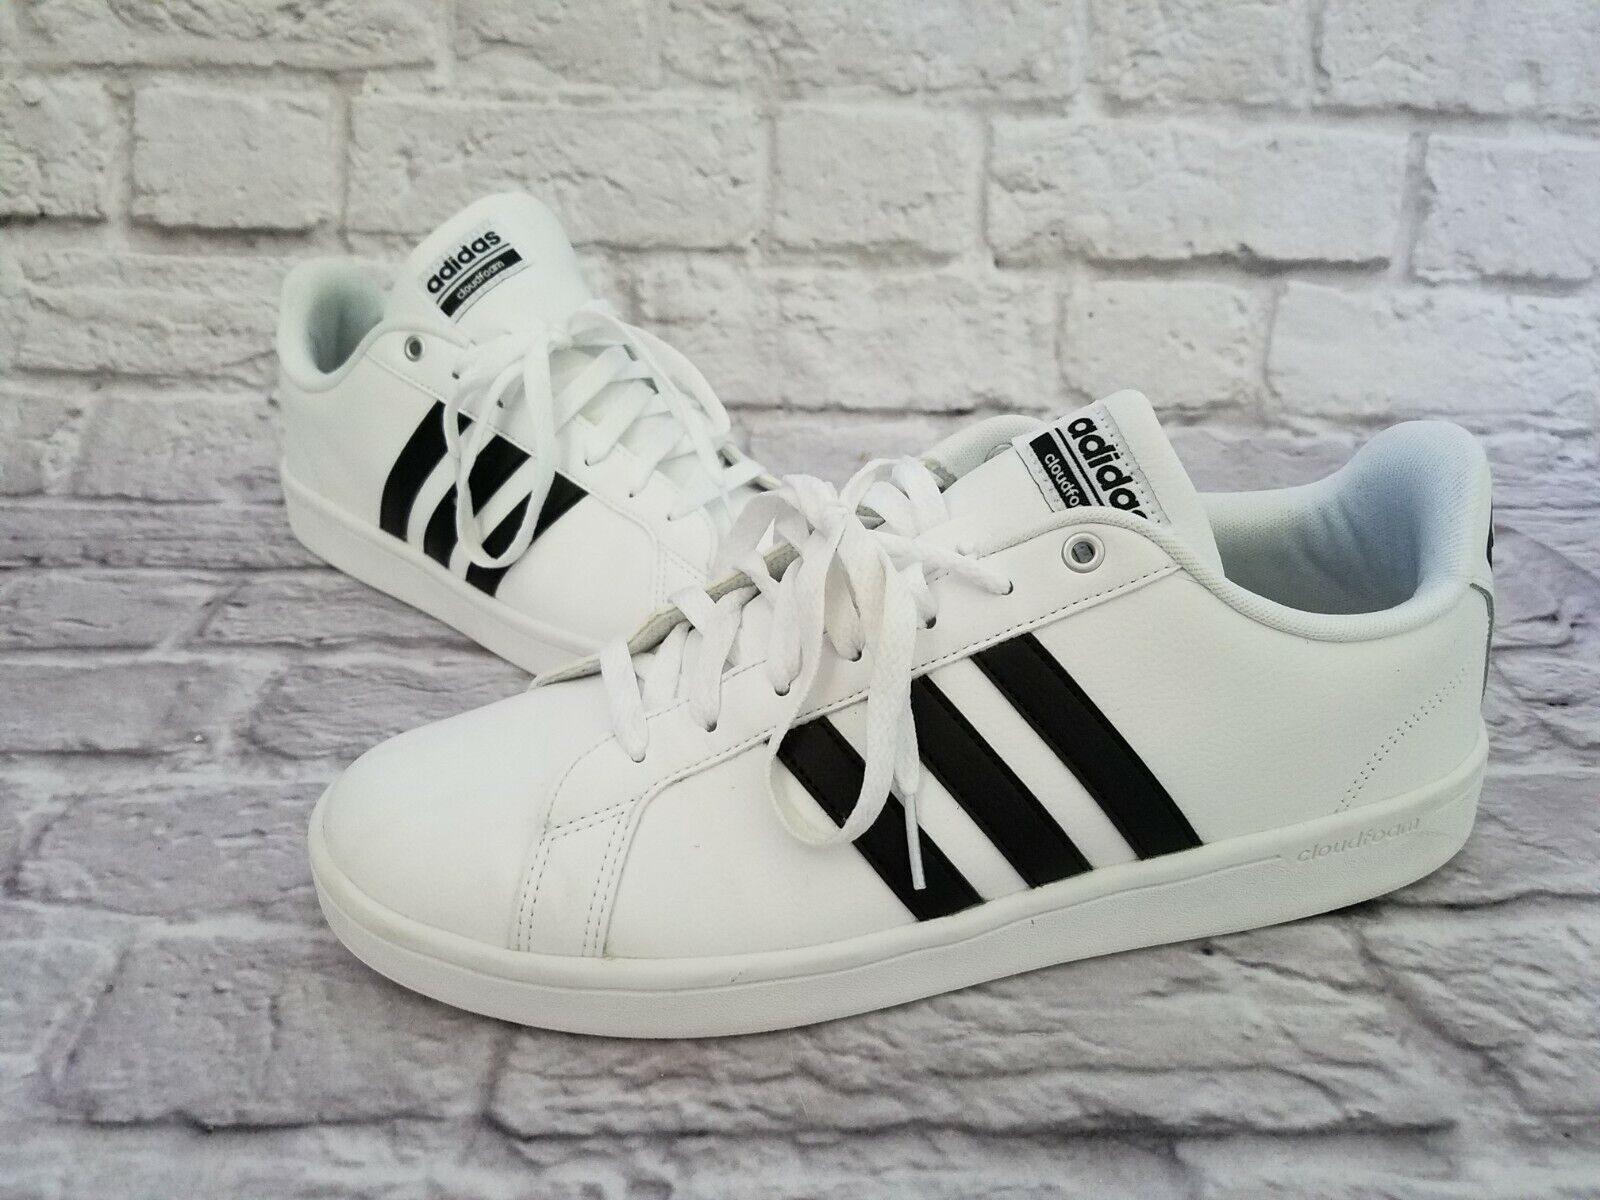 ADIDAS Size 10.5 NEO Cloudfoam Advantage Black Stripe Men's Shoes Style:  AW4294